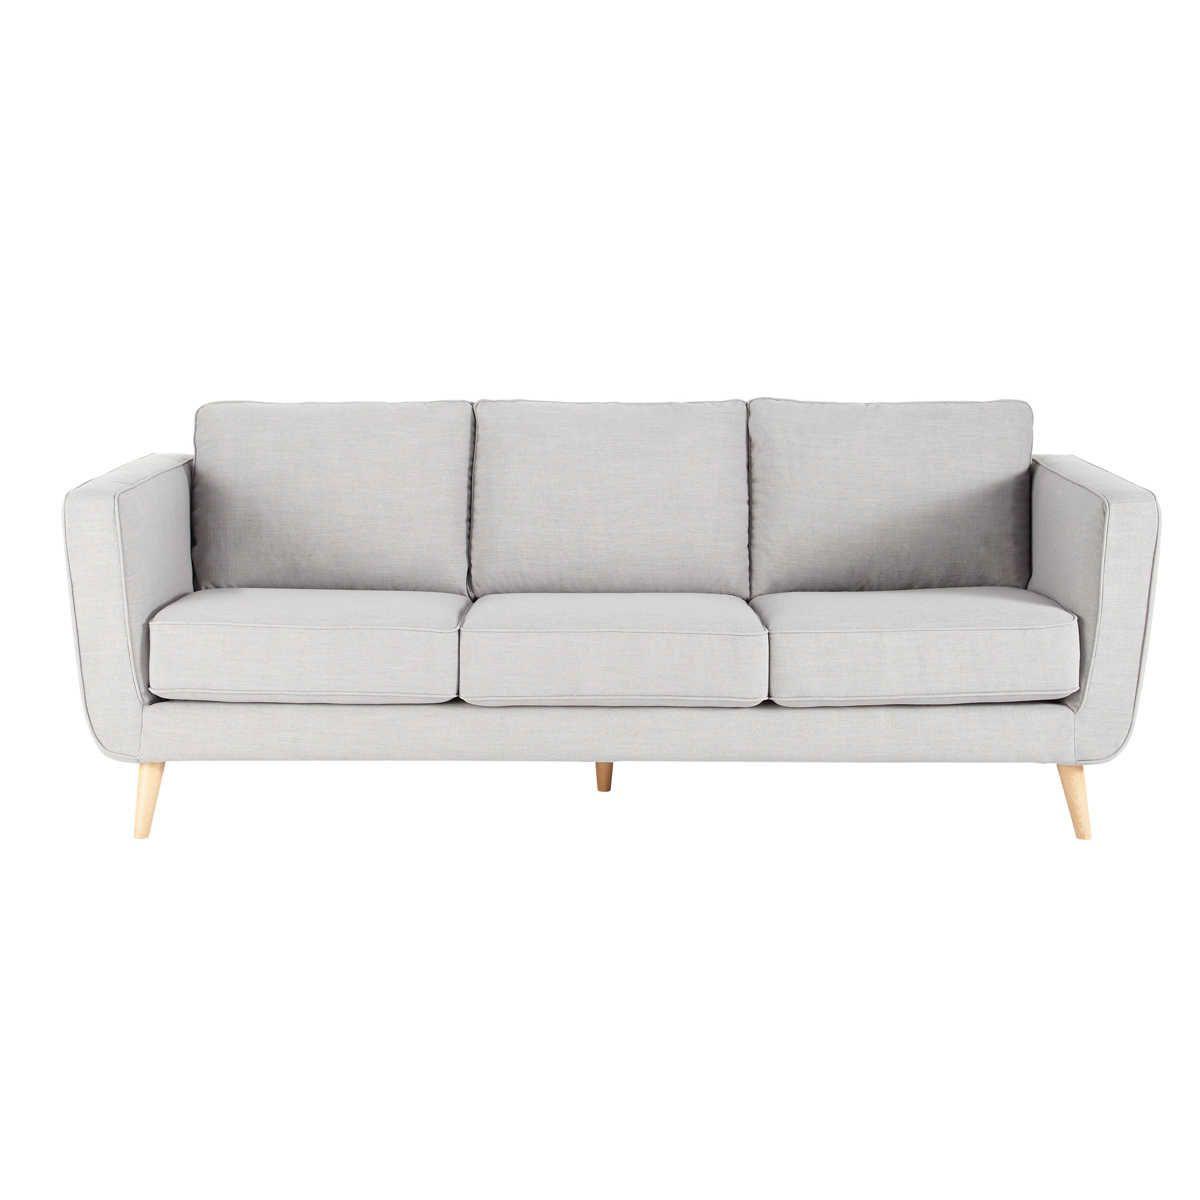 Canapes Droits Sofa Furniture Cool Furniture